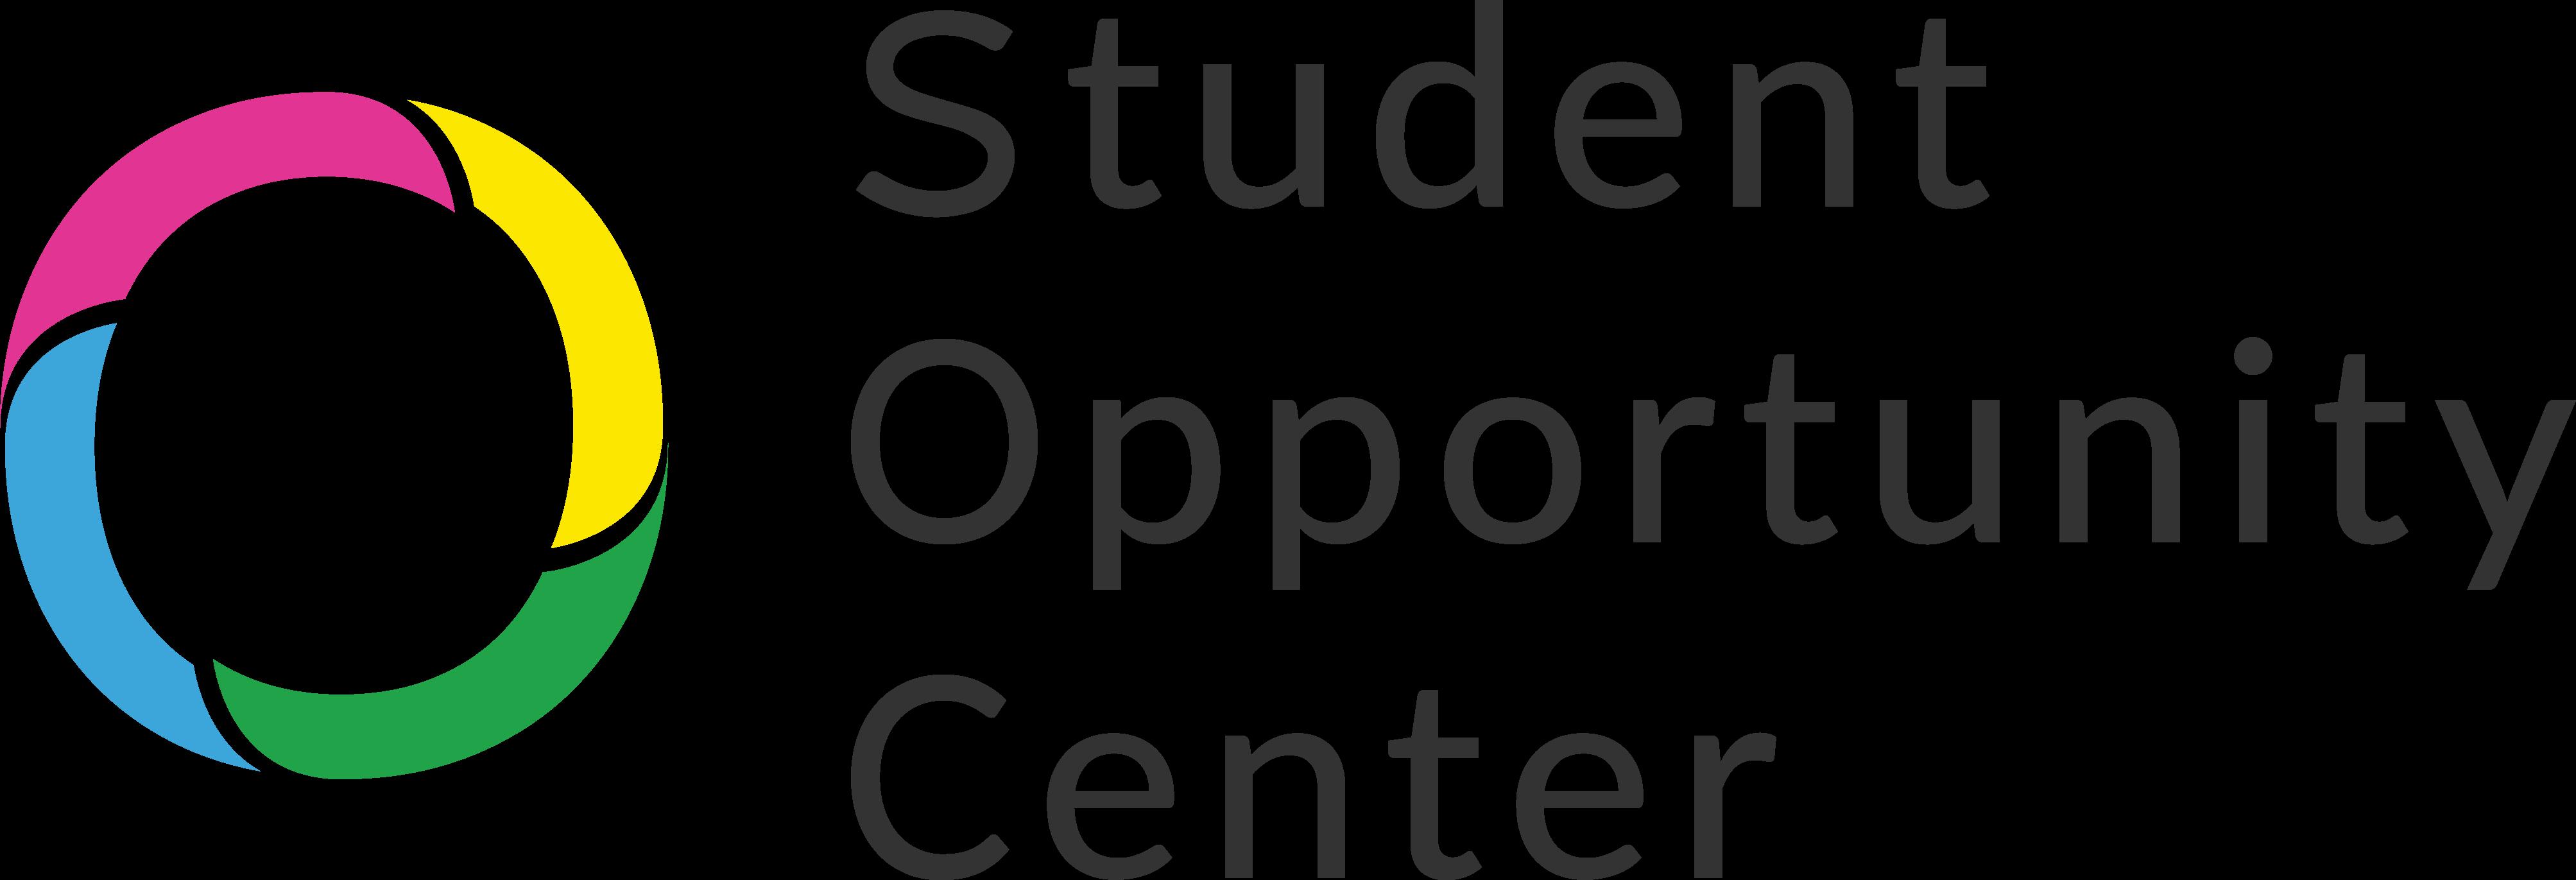 STUDENT OPPORTUNITY CENTER